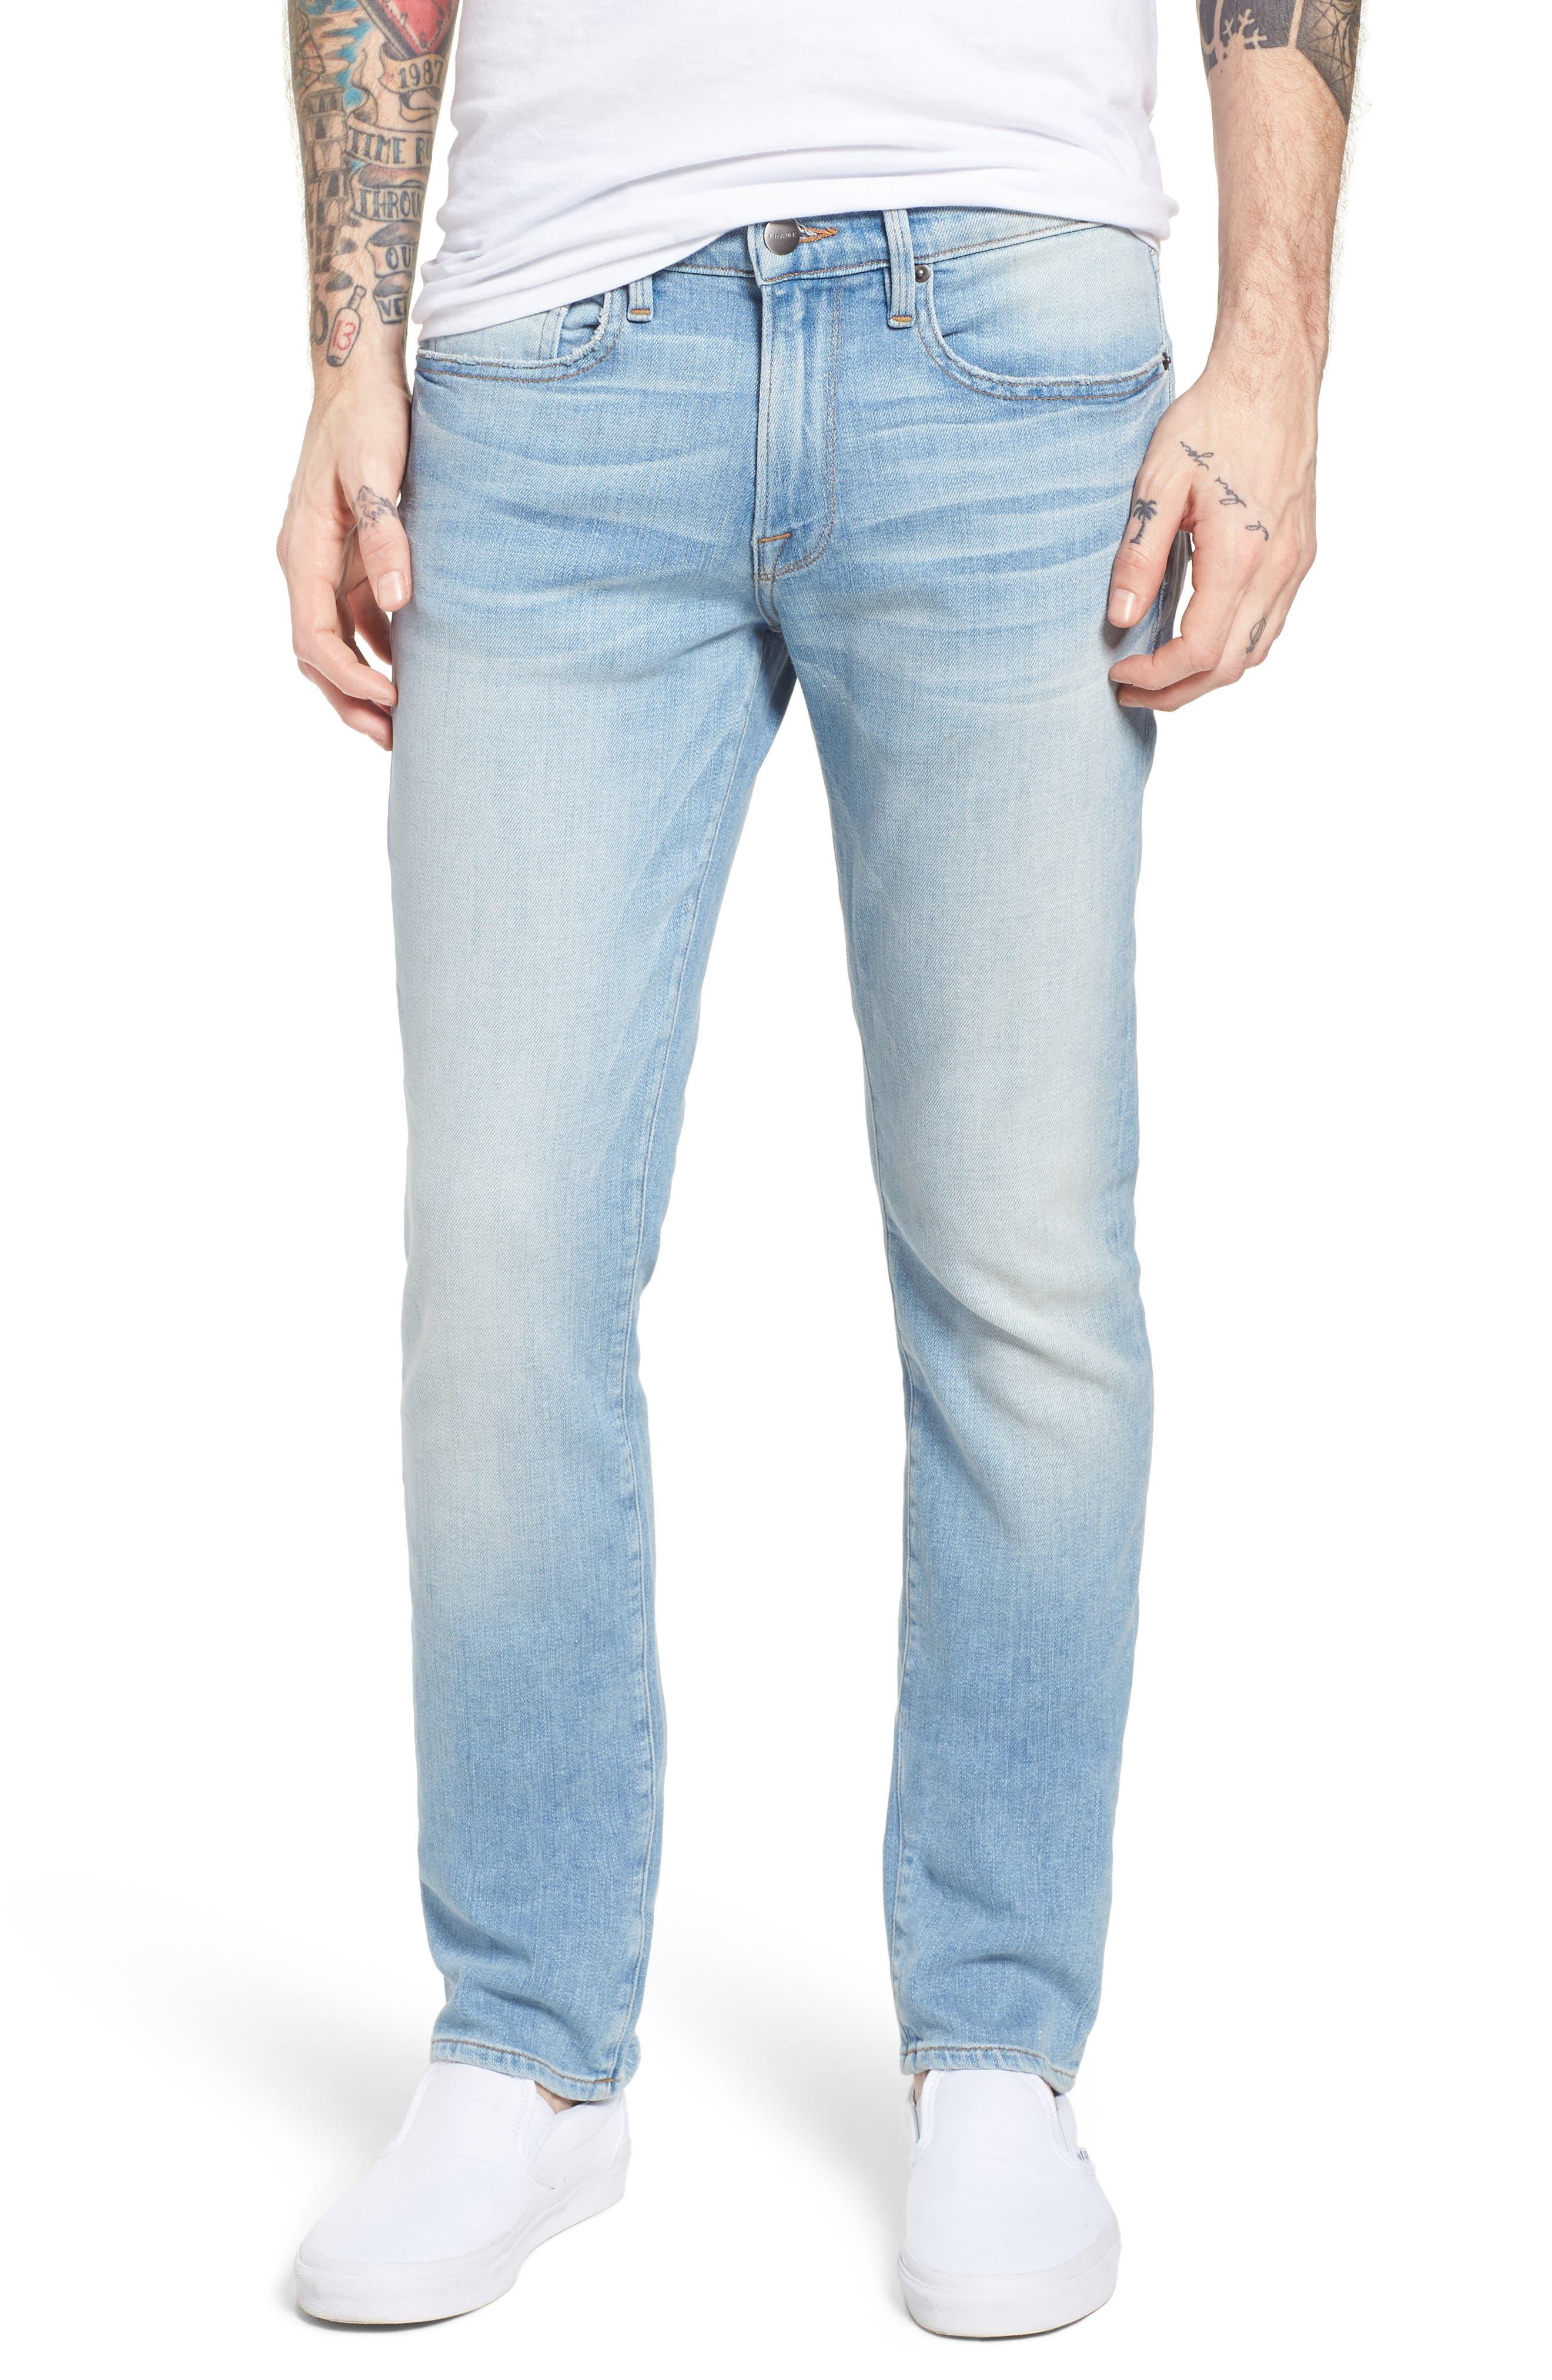 L'Homme Straight Leg Jeans,                             Main thumbnail 1, color,                             Finn